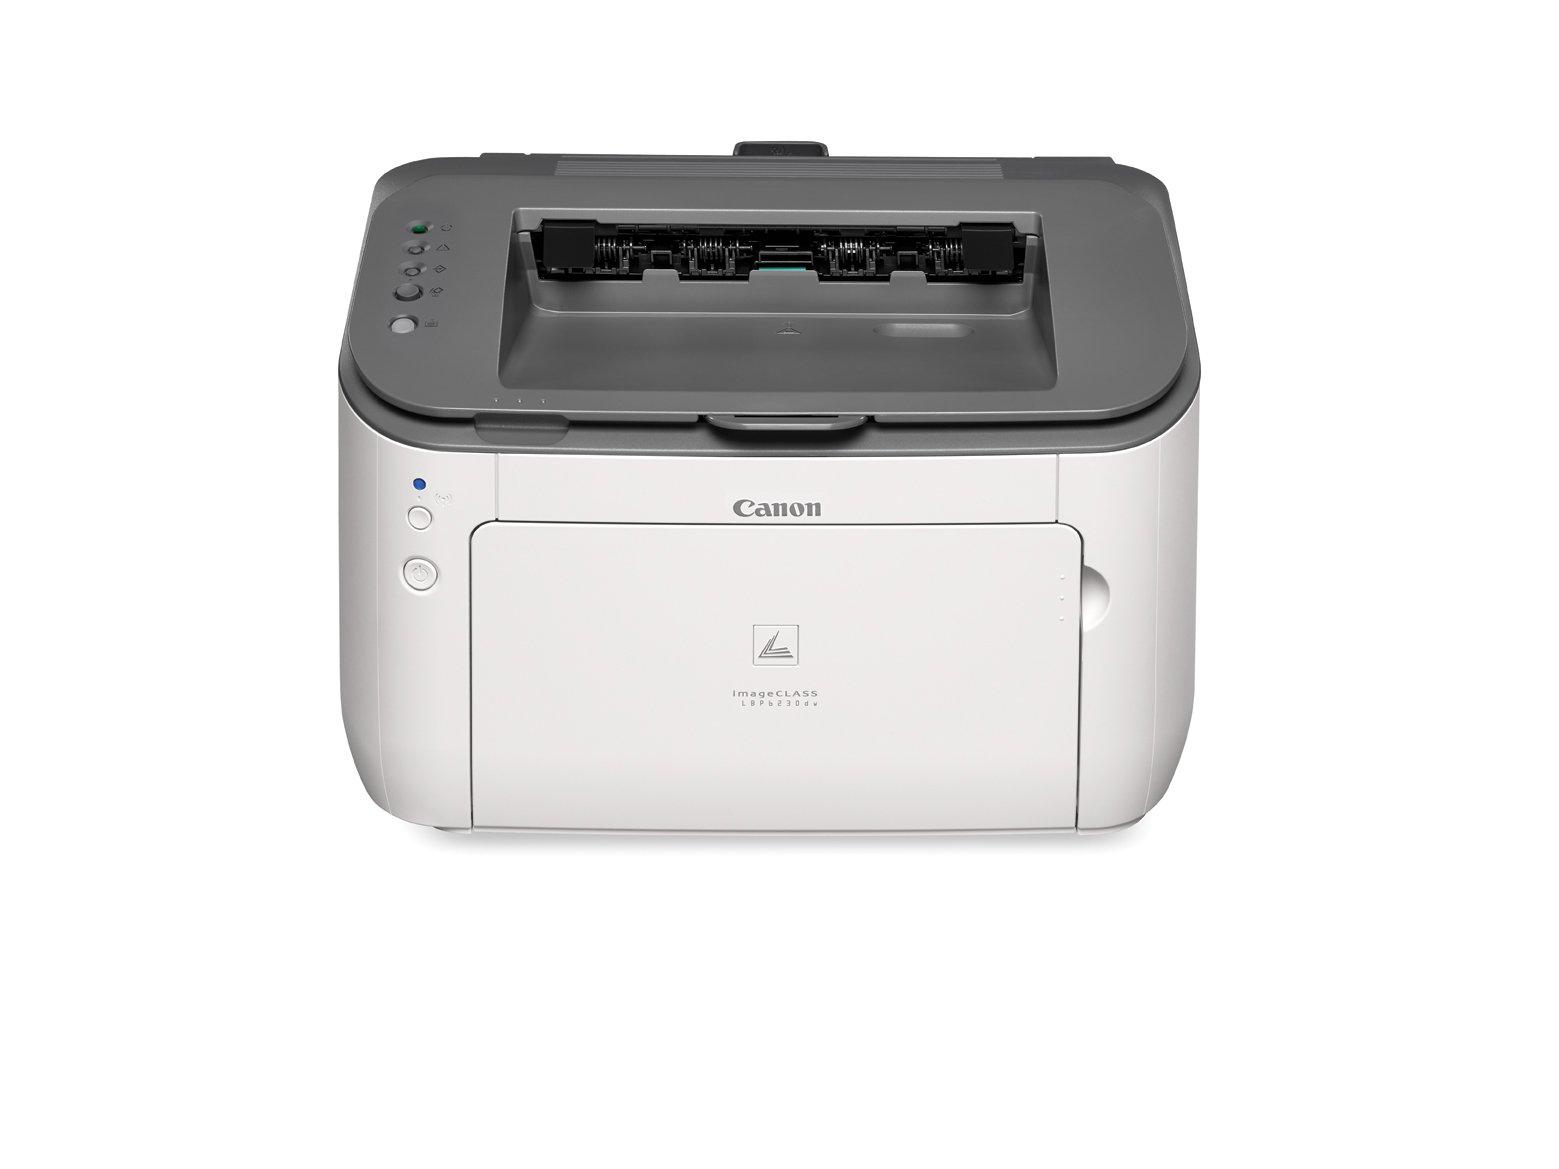 Canon imageCLASS LBP6230dw Wireless Printer